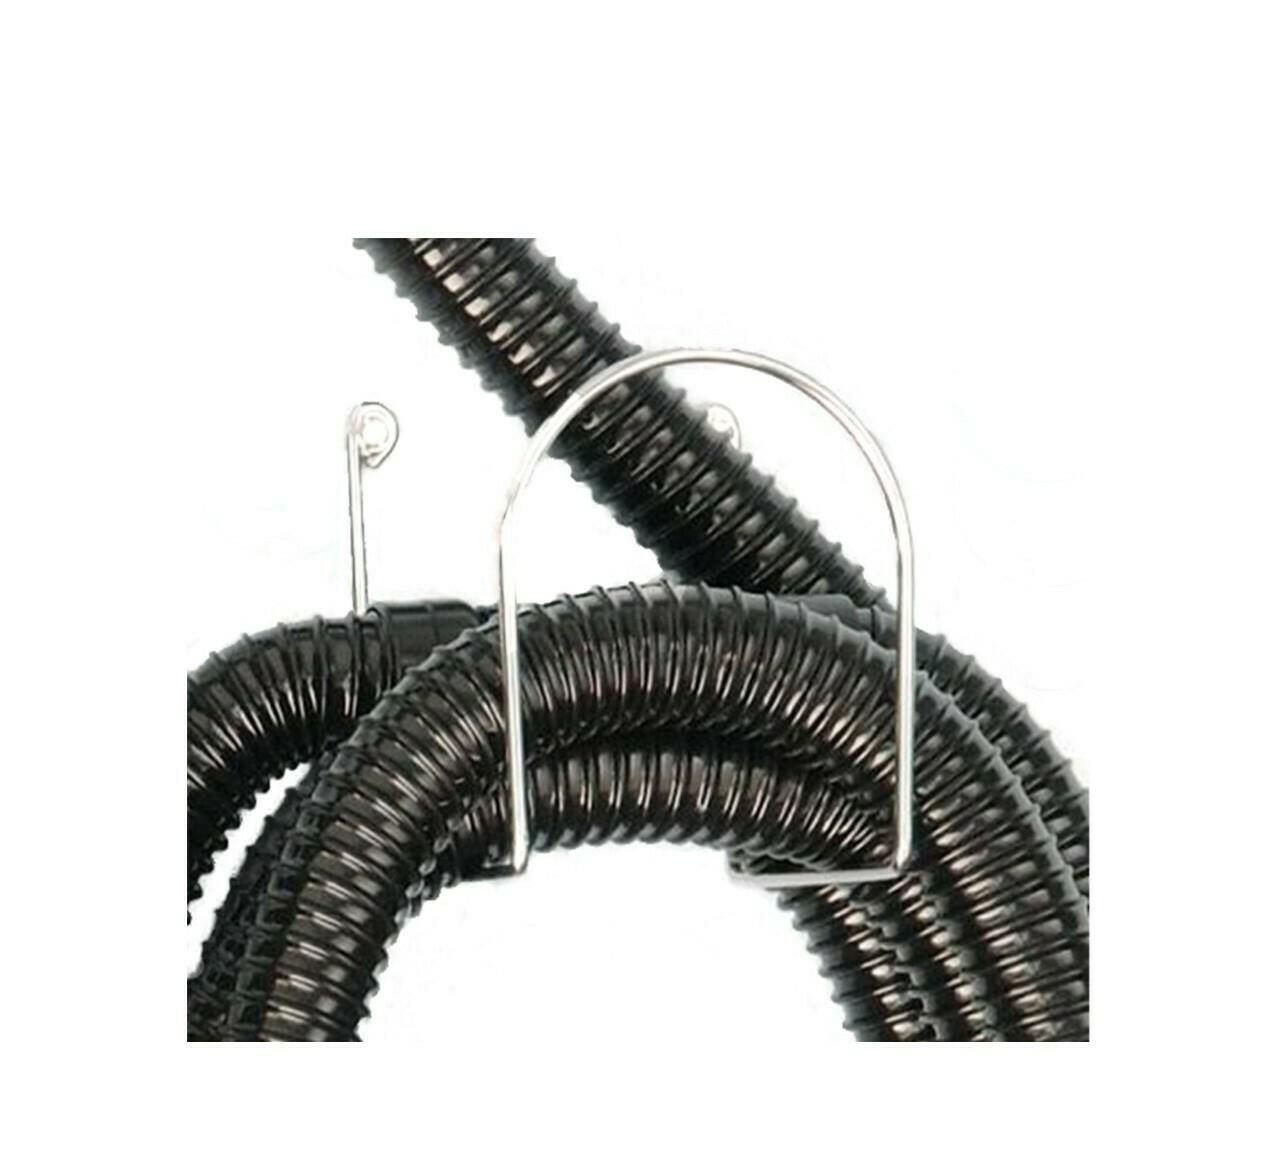 Agarradera de metal para manguera Big boi (Metal Hose Hanger)